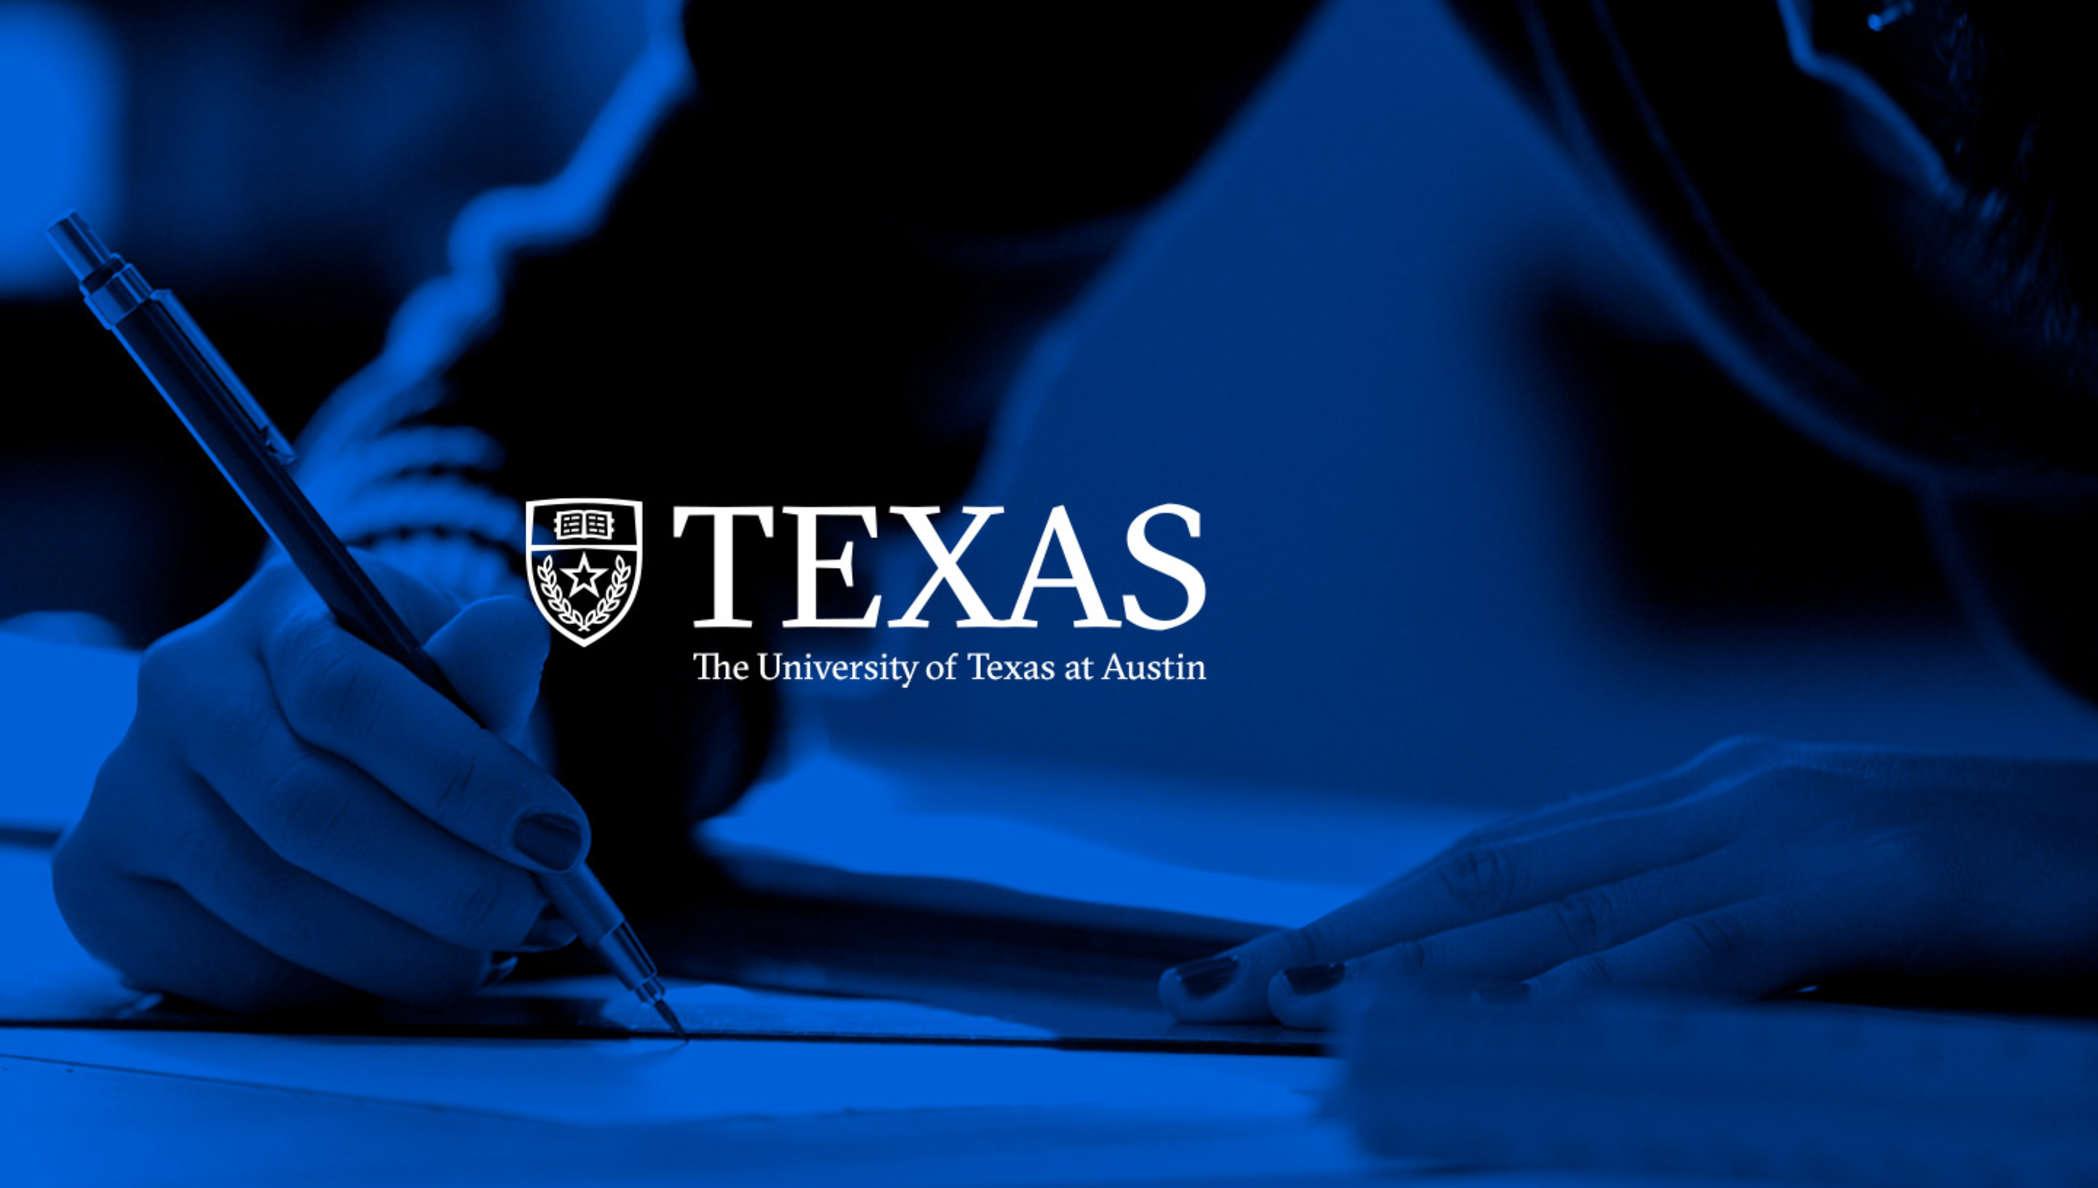 DocuSign customer, The University of Texas at Austin's logo.